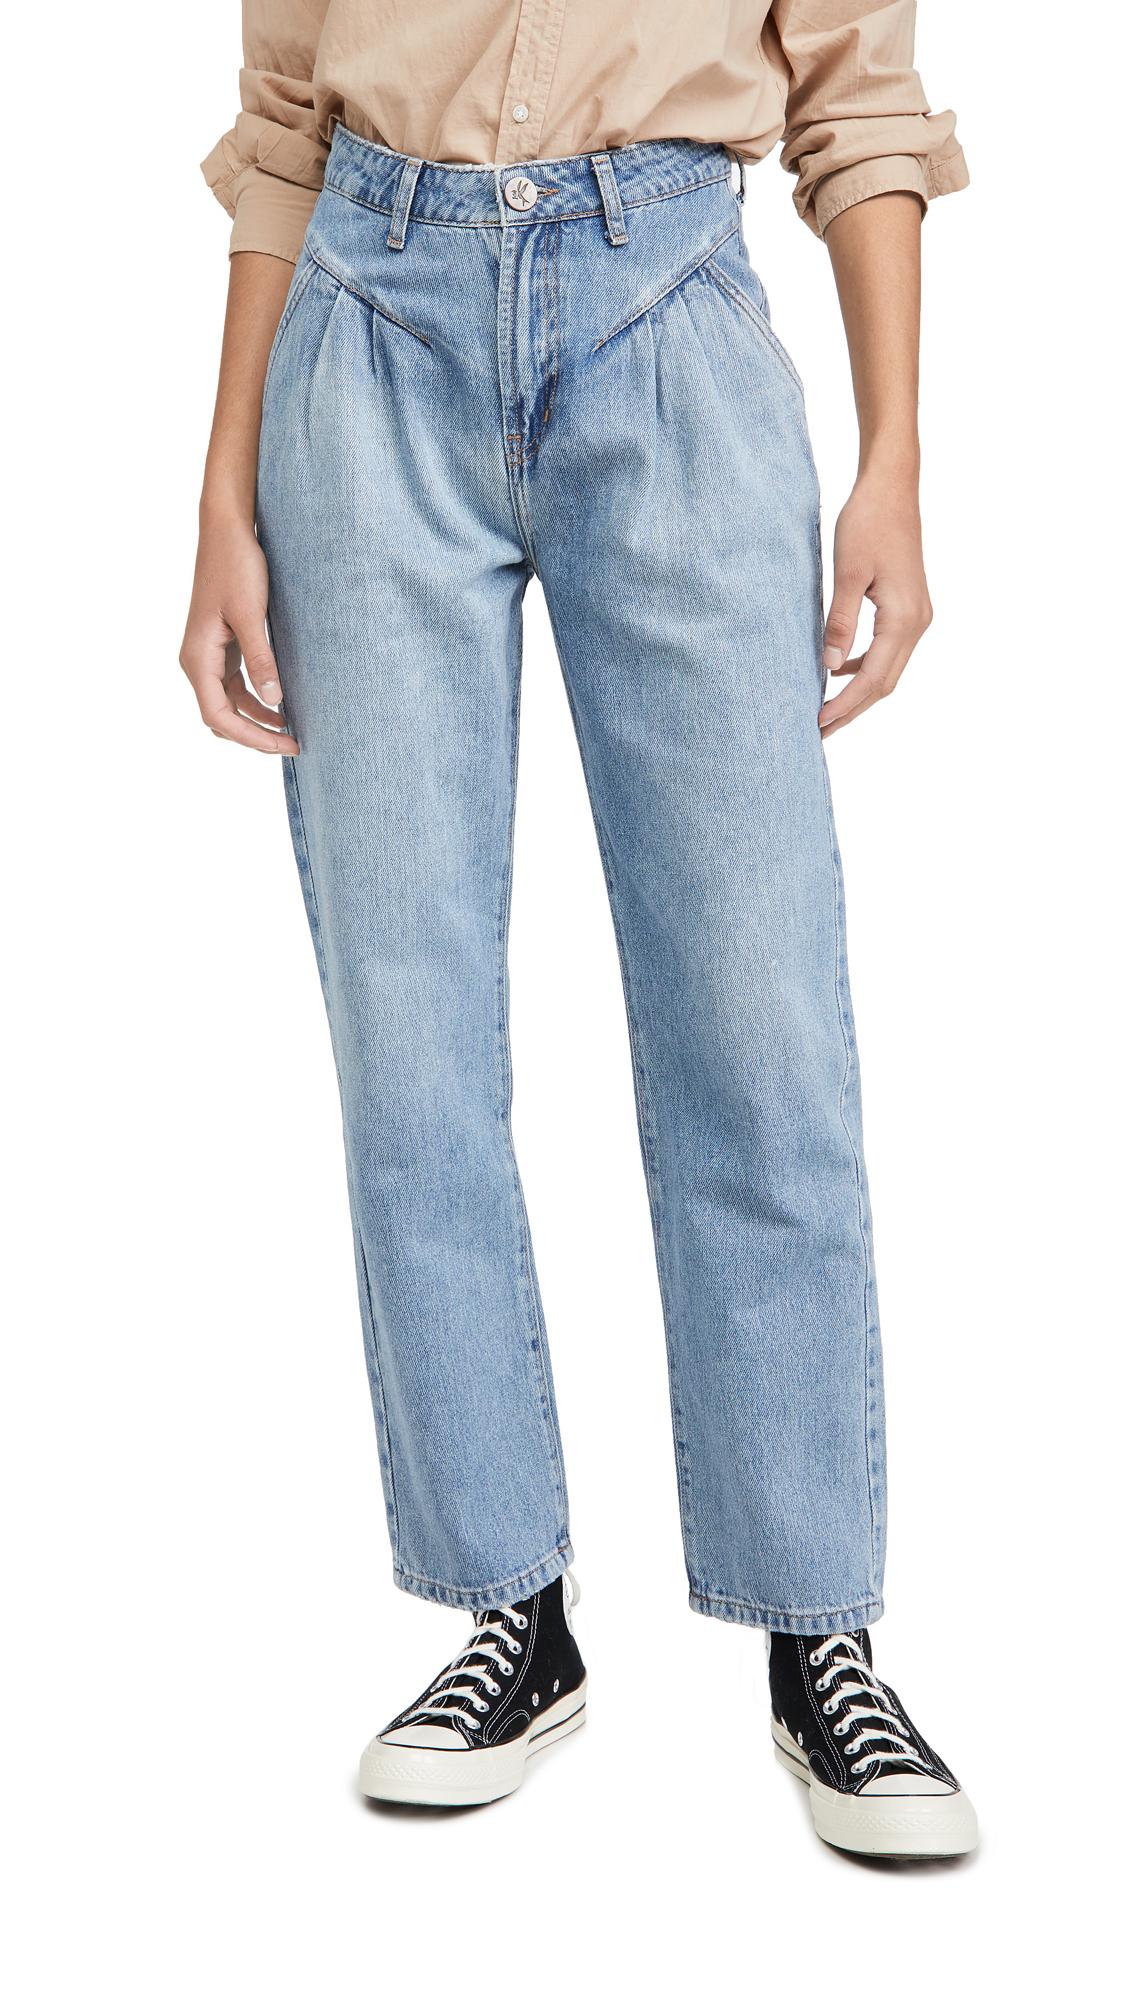 One Teaspoon Streetwalkers High Waist 80's Jeans